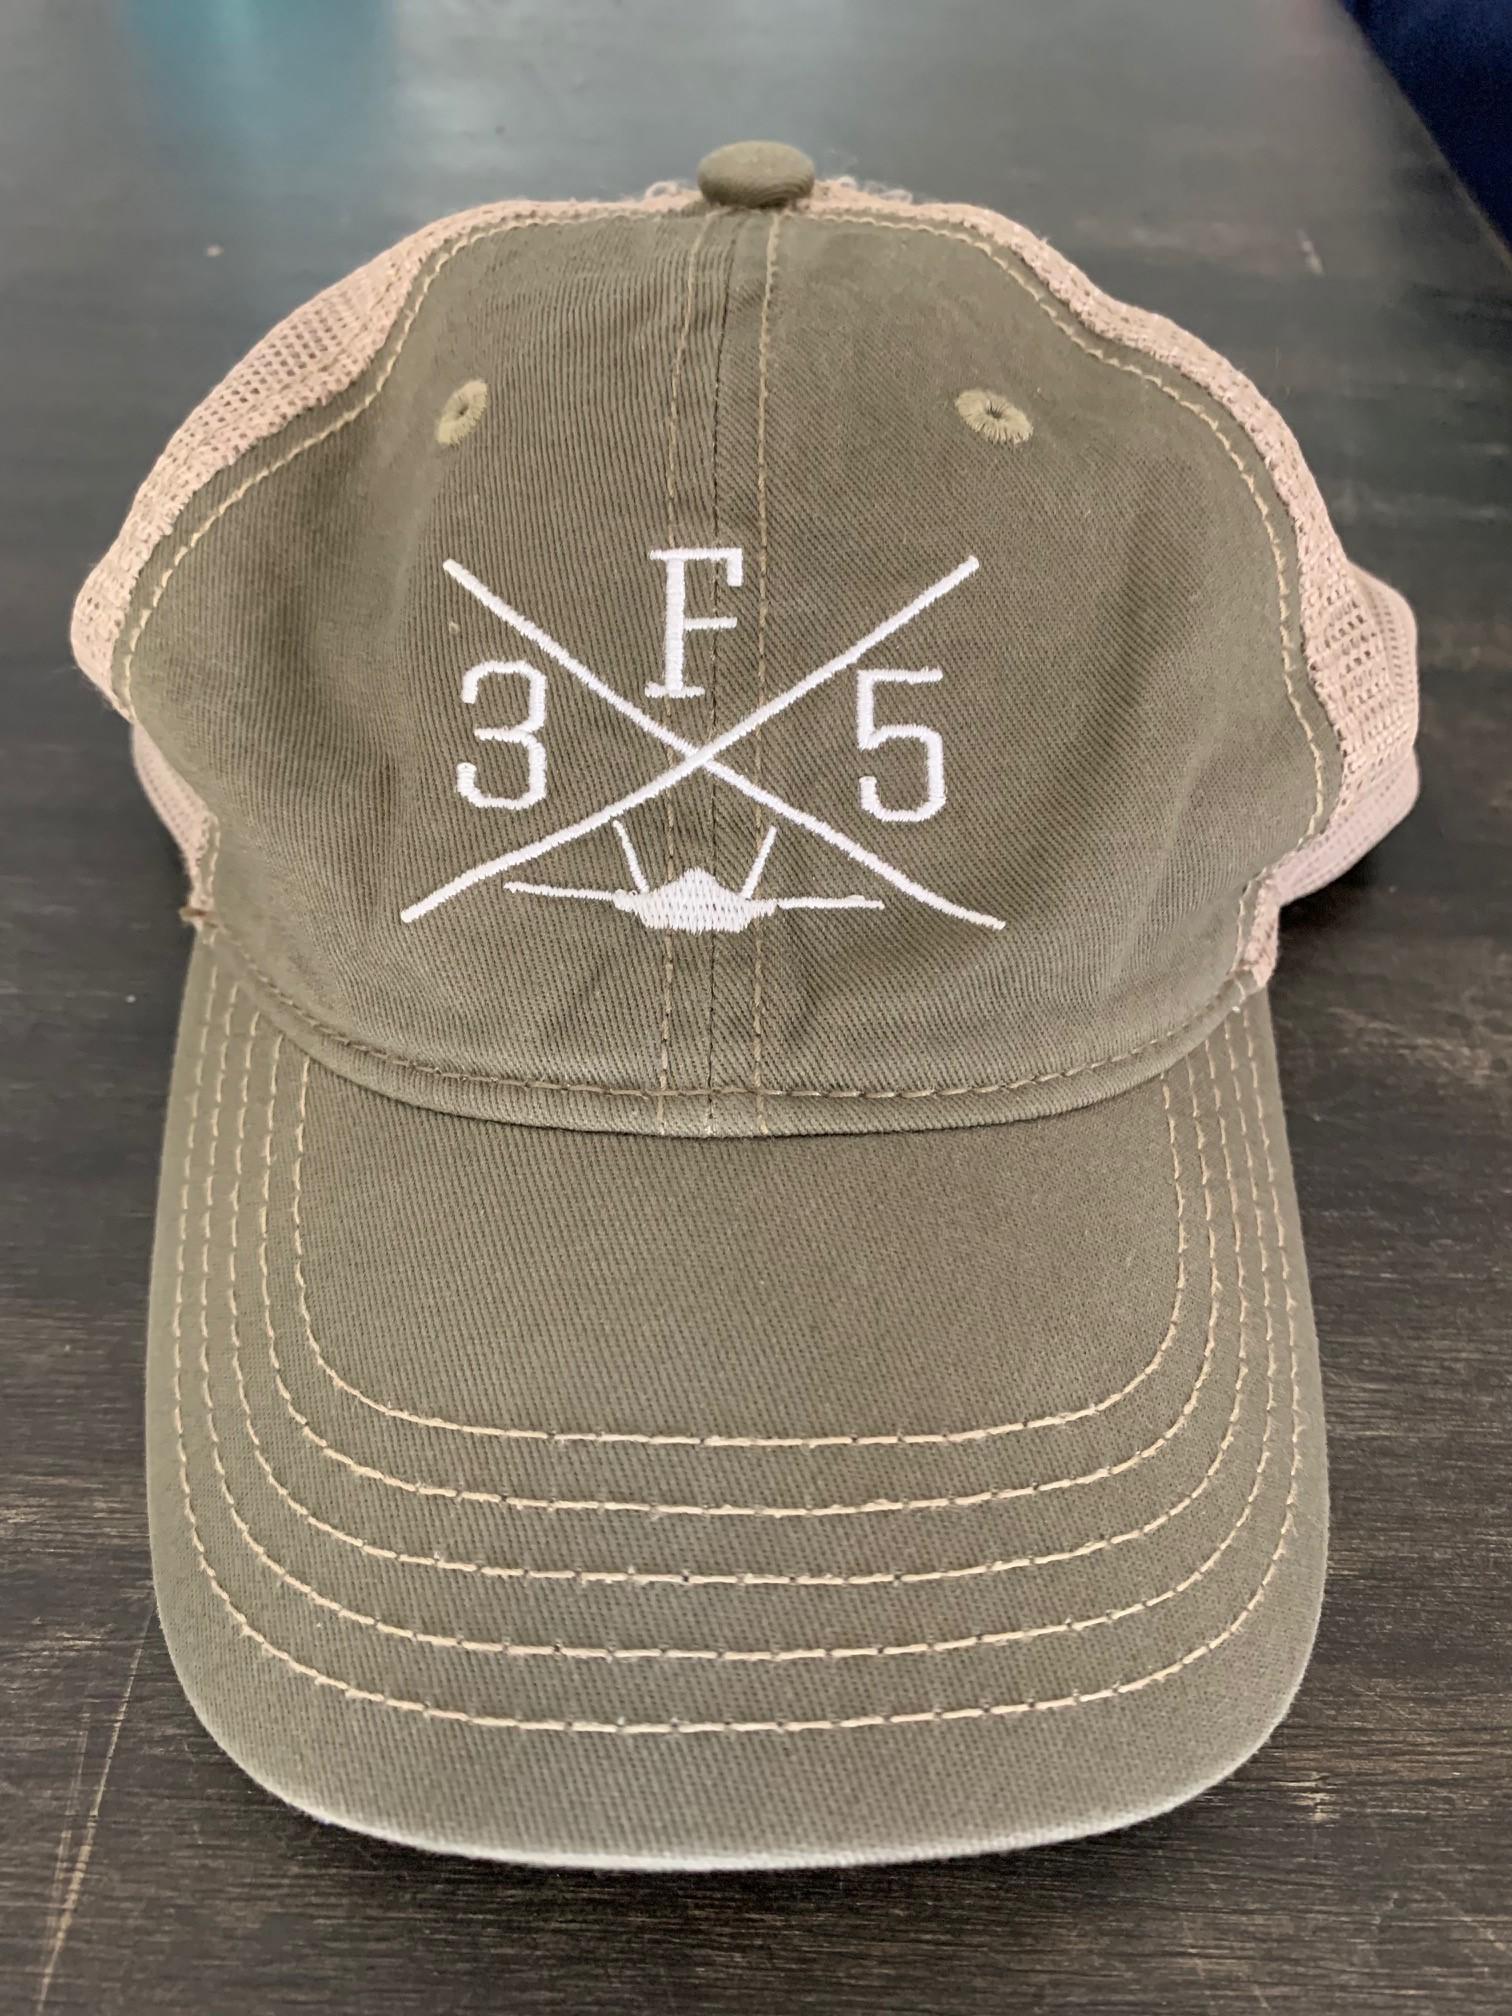 3F5 ballcap